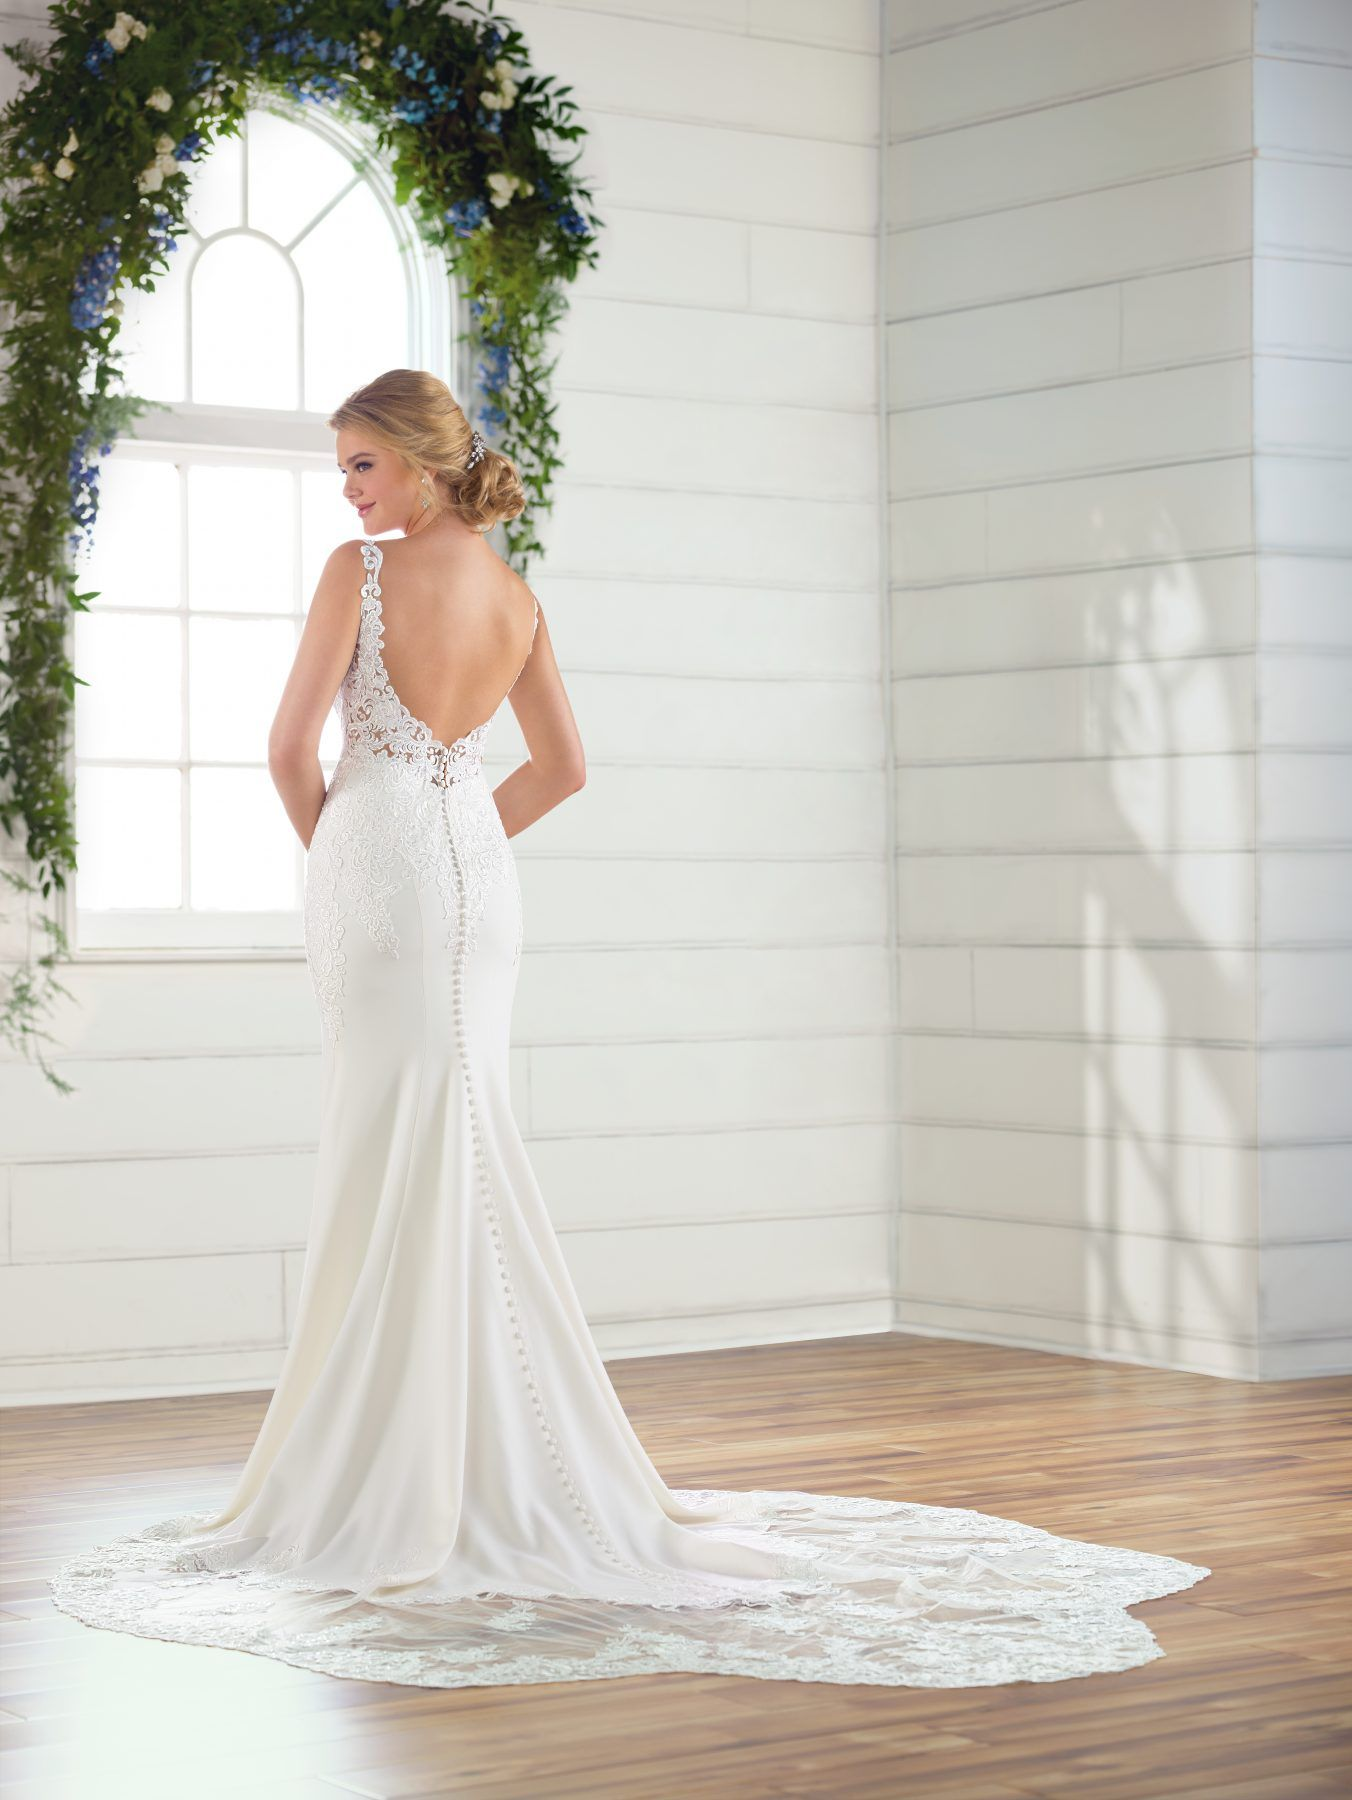 Vneck crepe wedding dress Essense of australia wedding